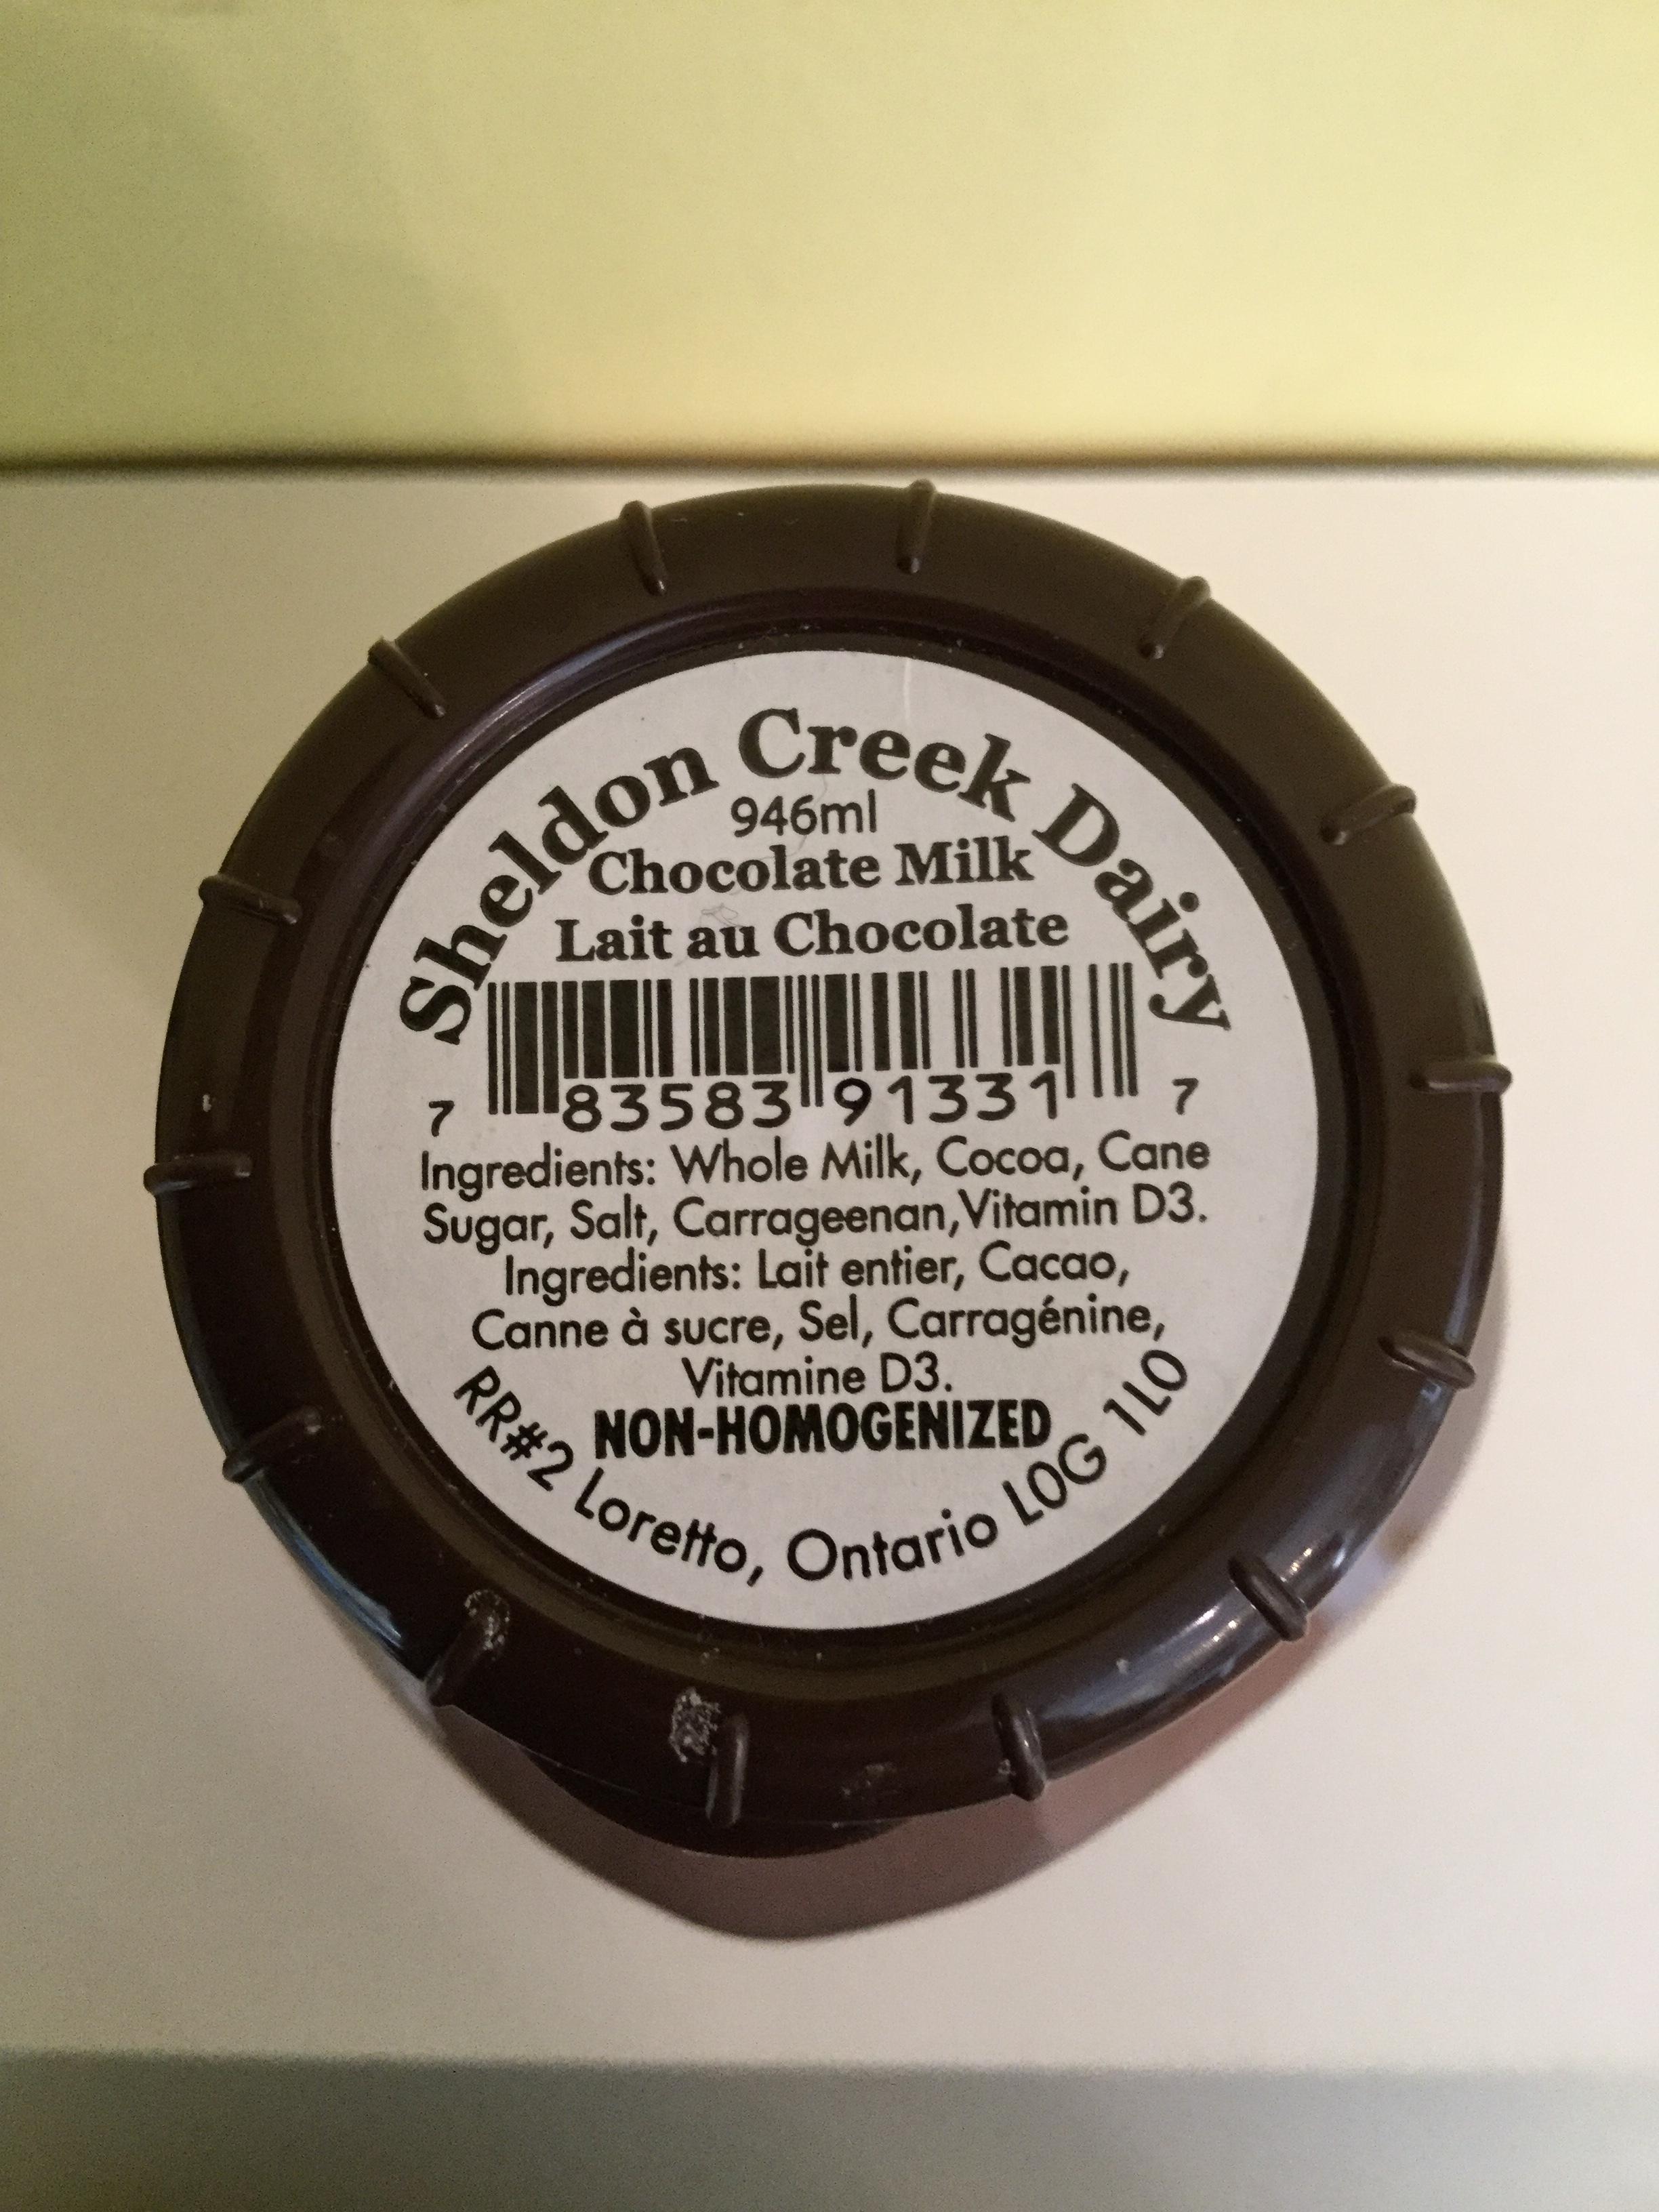 Sheldon Creek Dairy Chocolate Milk Top